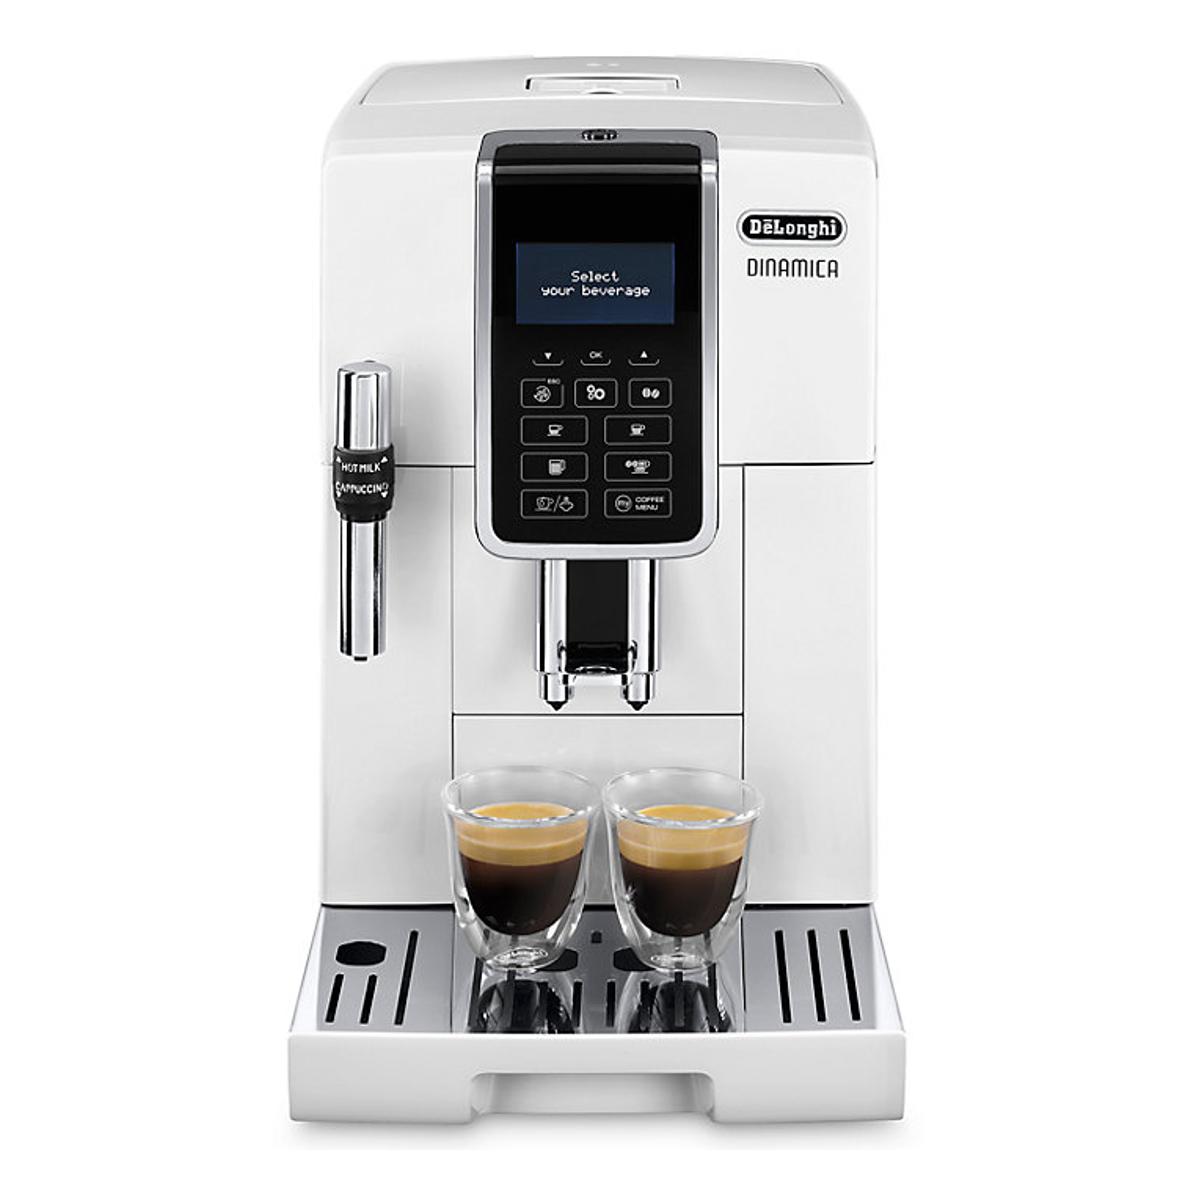 De Longhi Dinamica Ecam350 35 W Coffee Maker